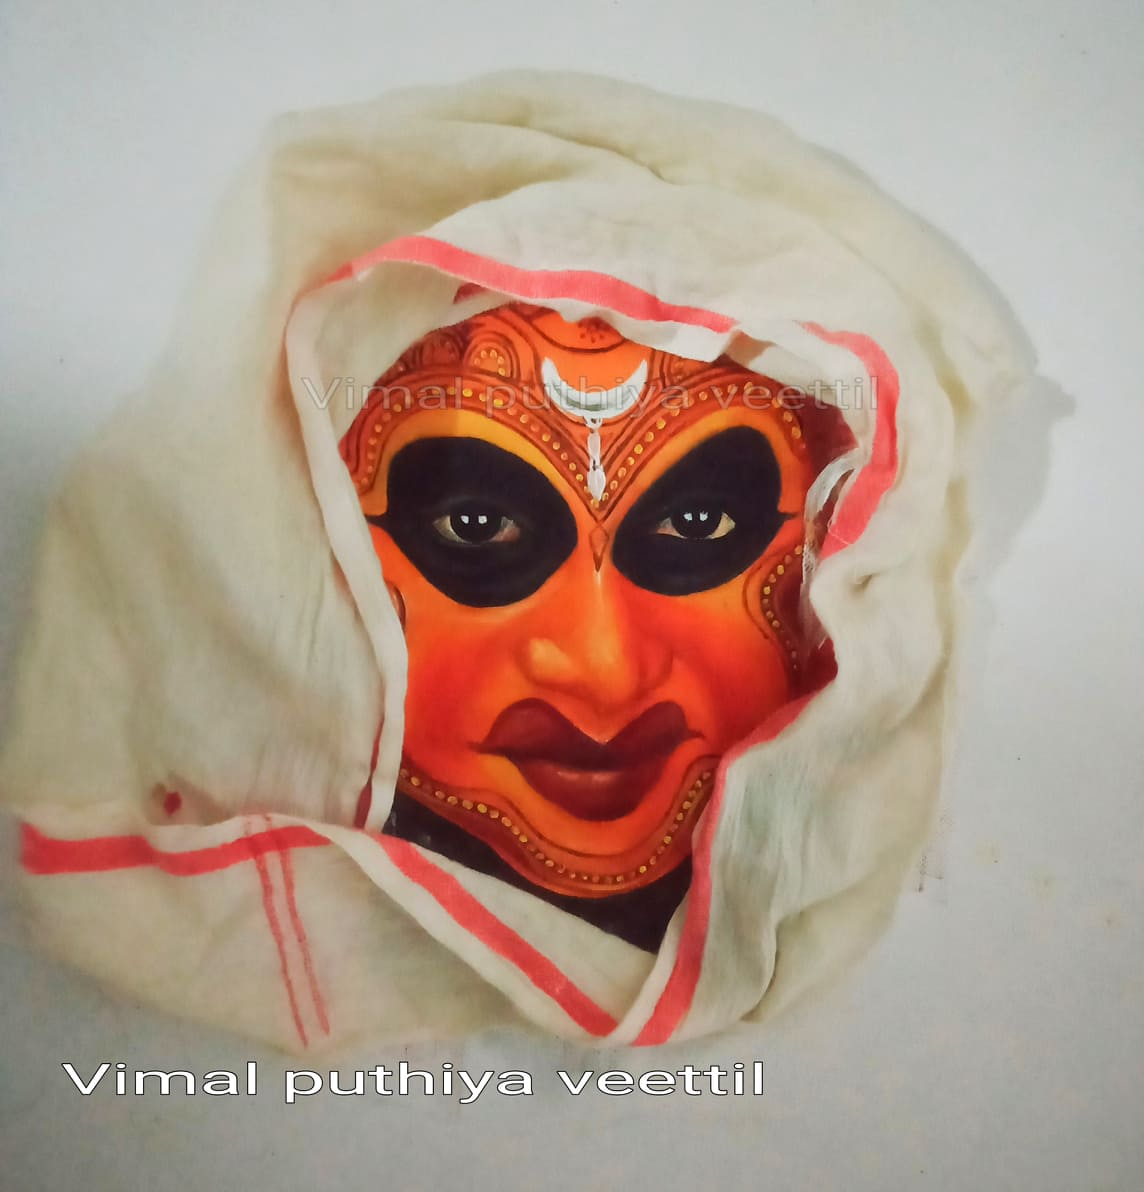 athmaonline-vimal-puthiya-veettil-002